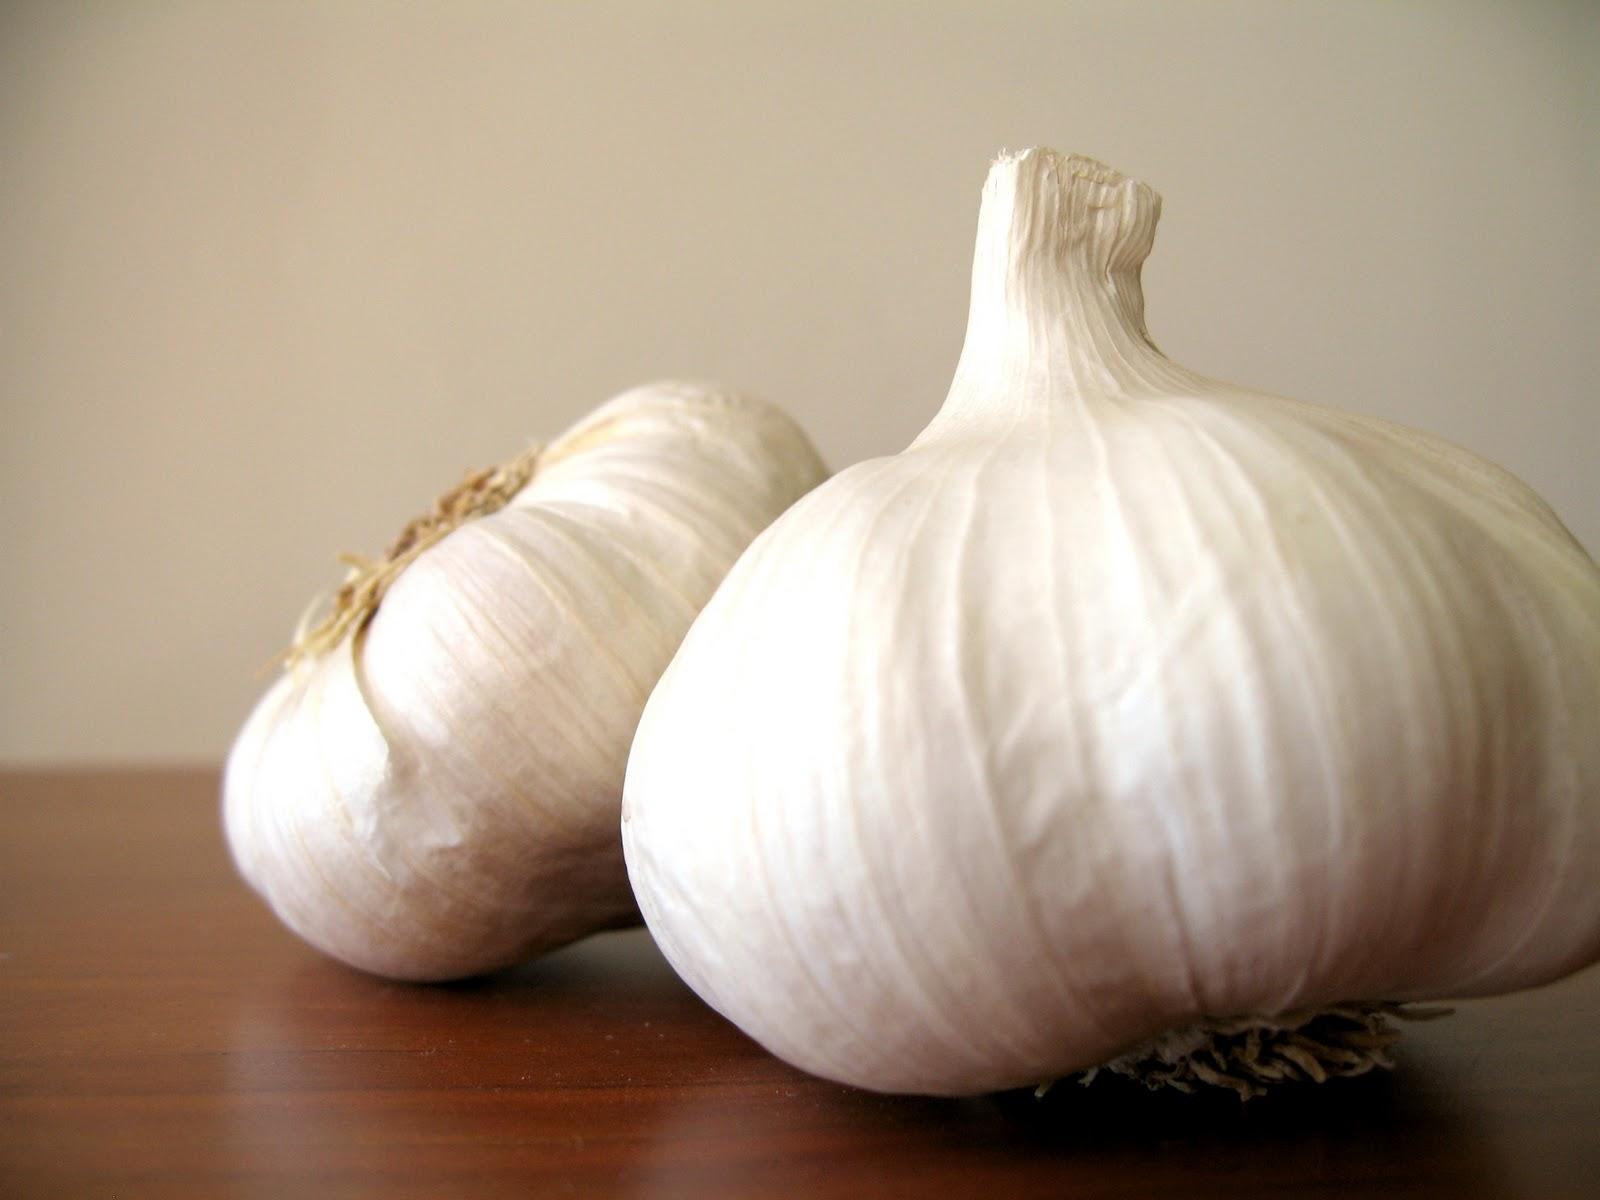 Apricosa: Garlic Tutorial